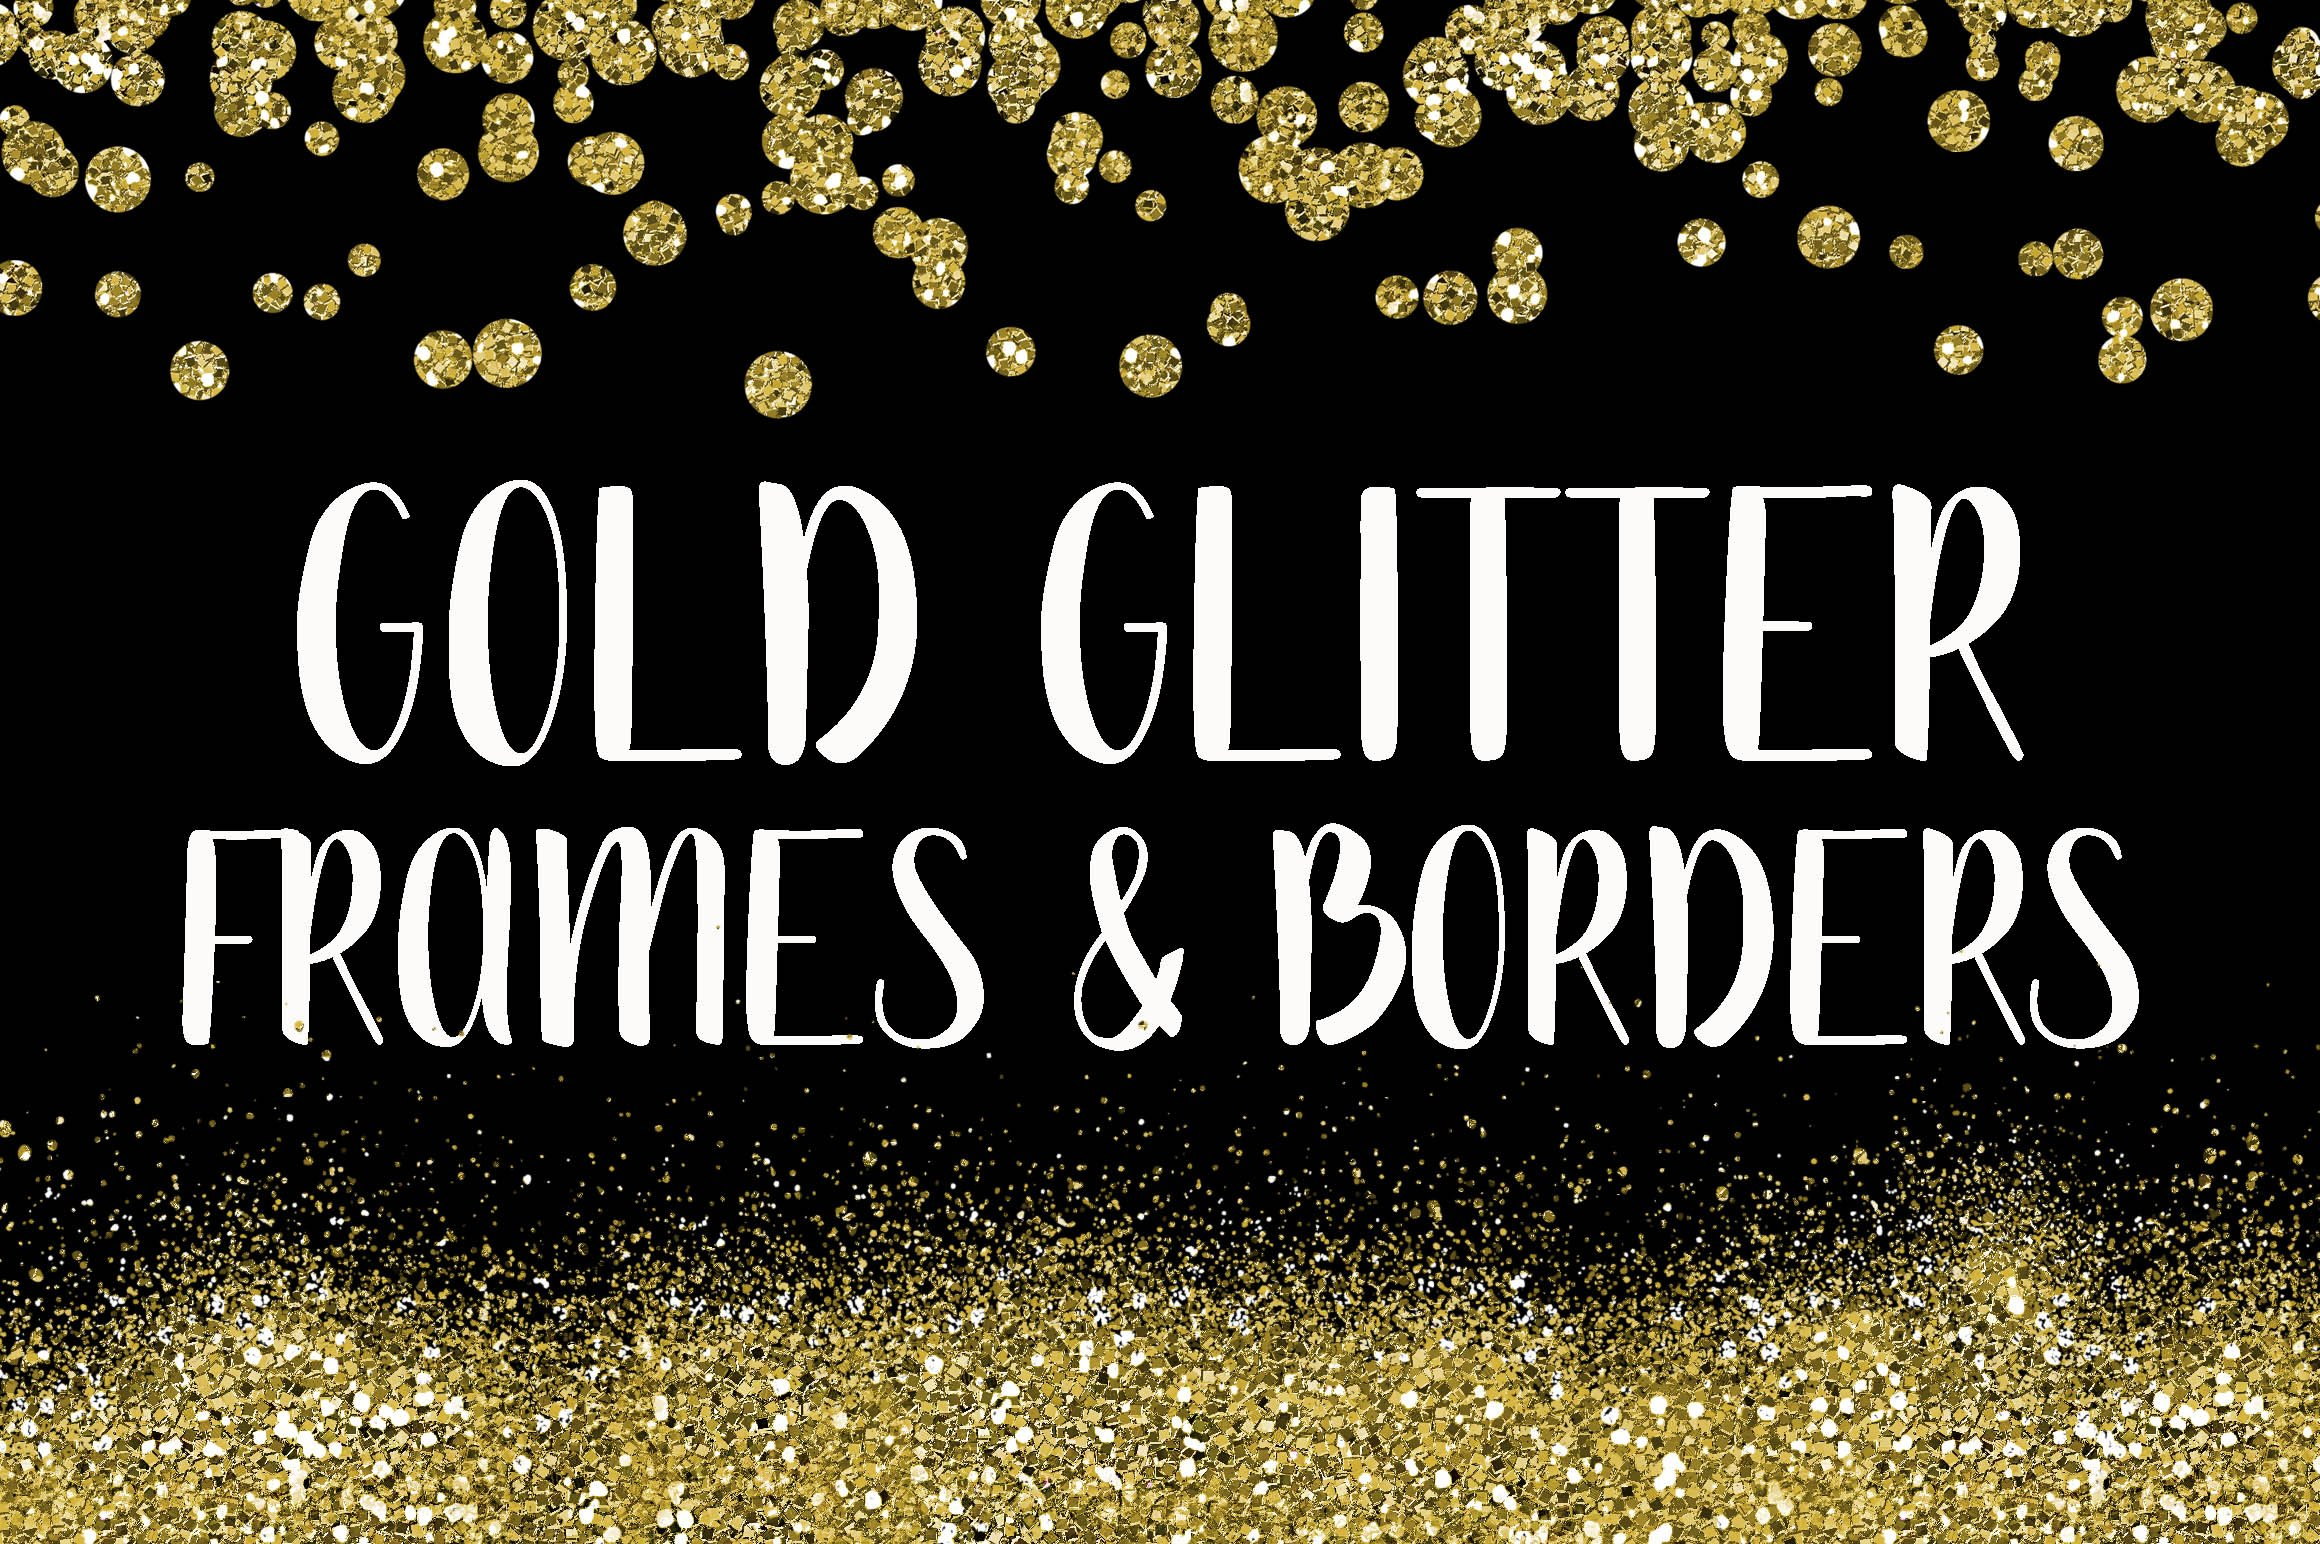 Gold Glitter Frames and Borders ~ Illustrations ~ Creative Market